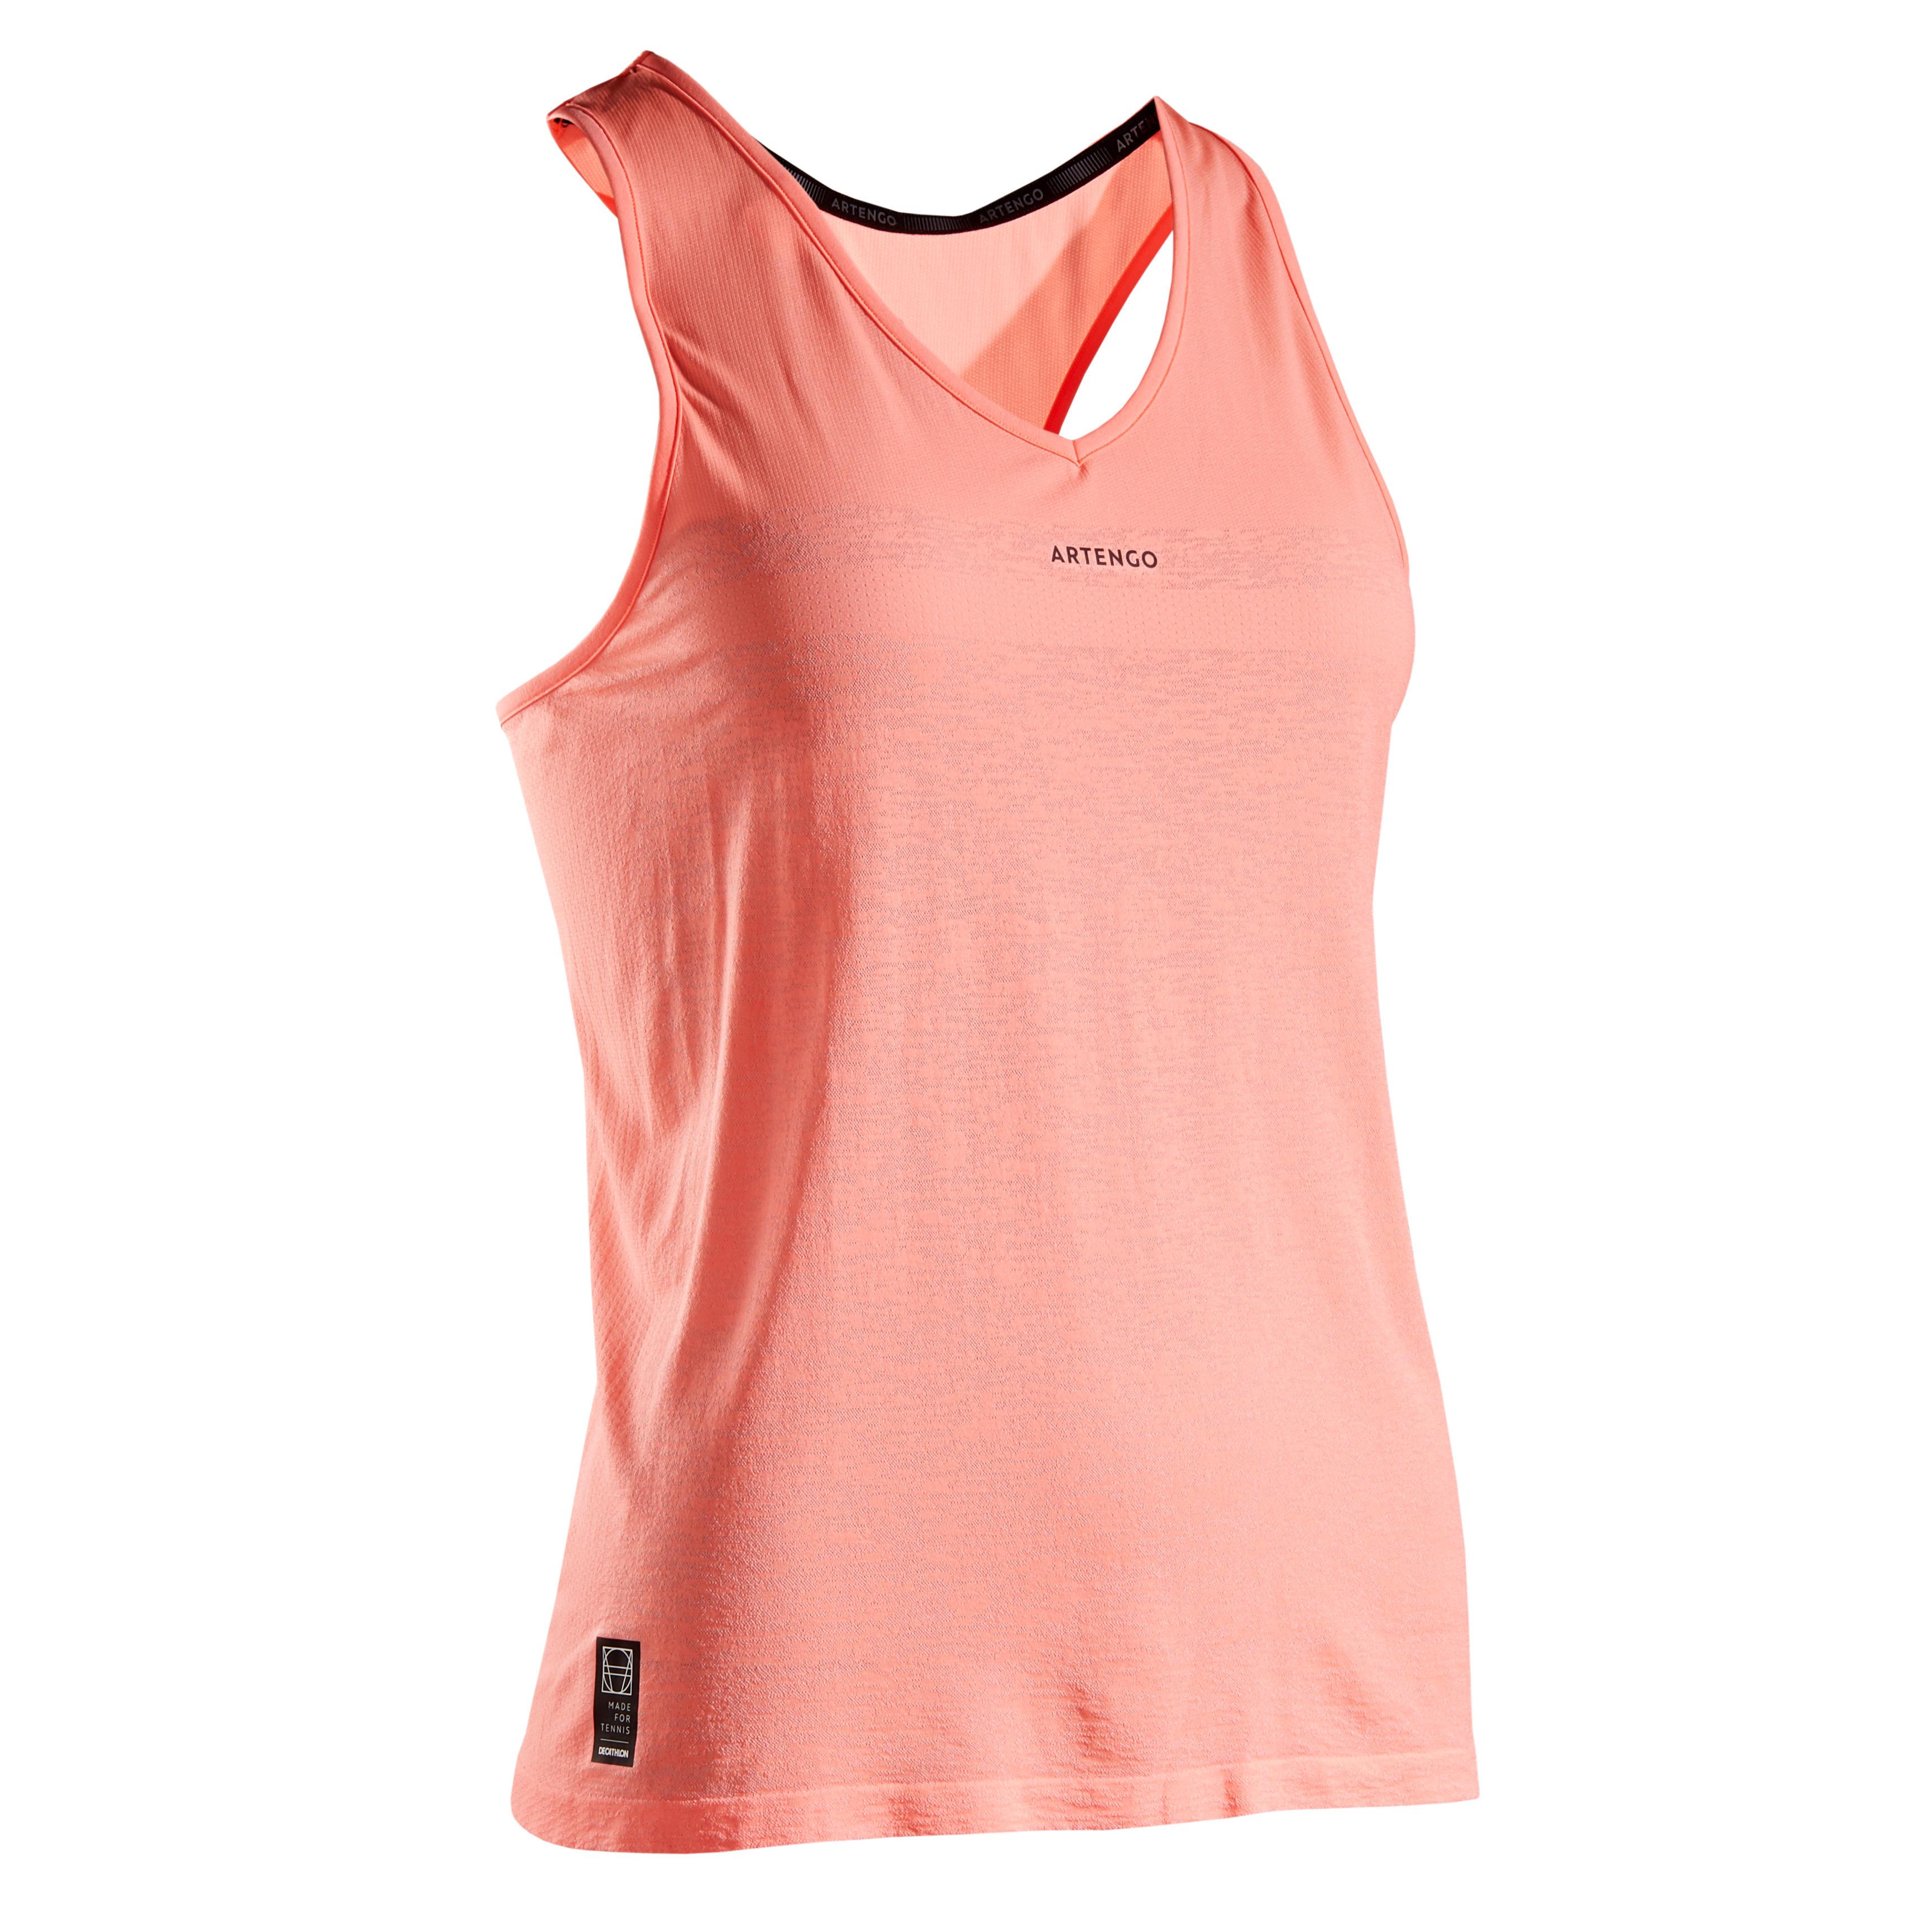 Tennis-Top TK Light 990 Damen | Sportbekleidung > Sporttops > Tennistops | Artengo